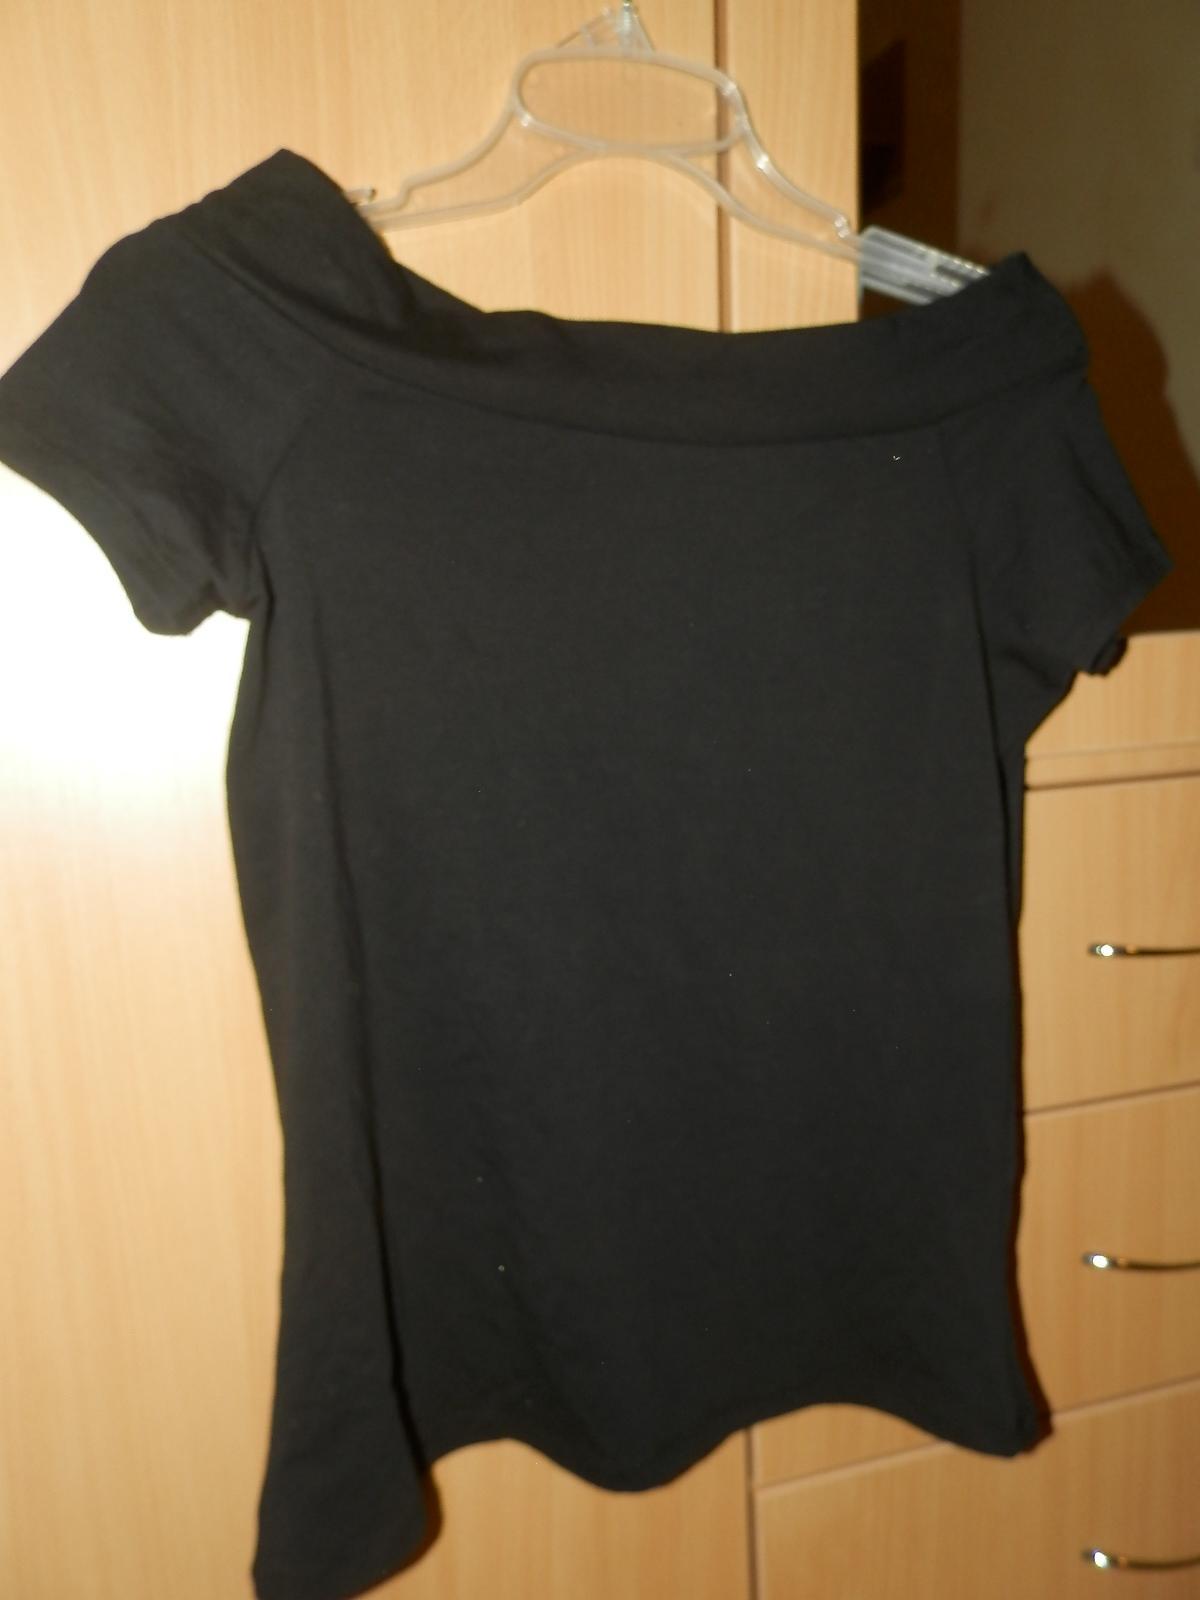 ATMOSPHERE elegantné elastické tričko M/L - Obrázok č. 2